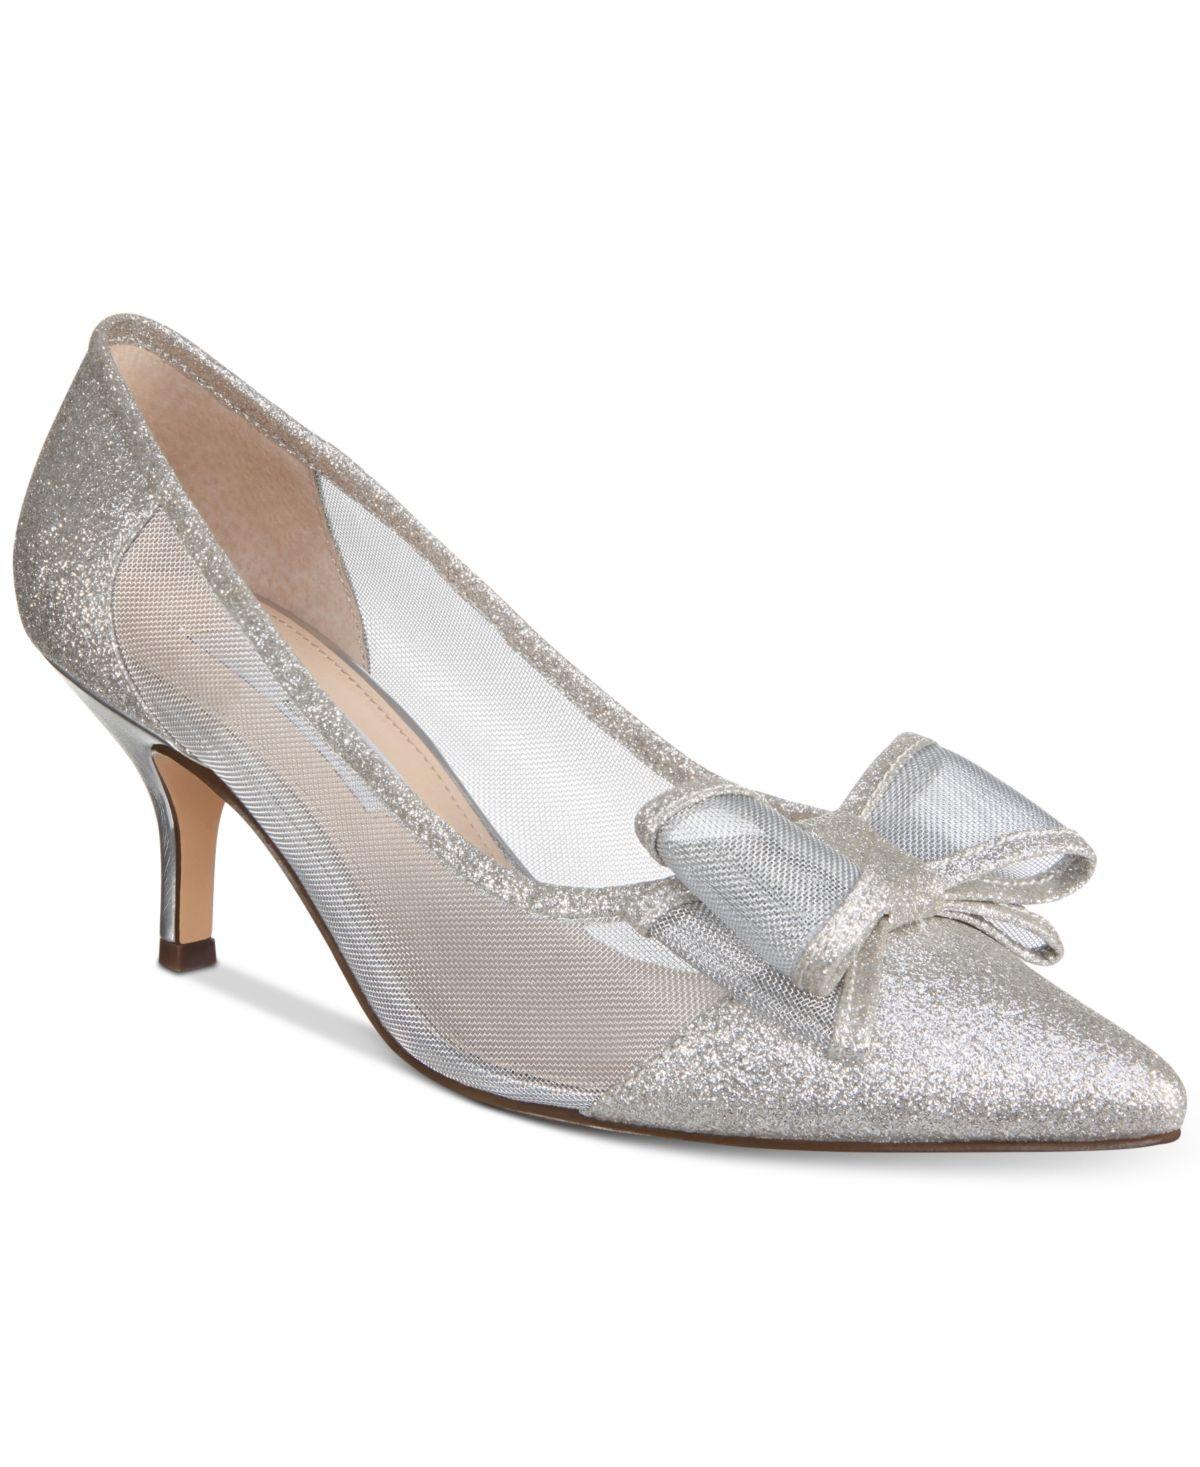 Nina Bianca Mesh Bow Kitten Heel Pumps Reviews Heels Pumps Shoes Macy S In 2020 Kitten Heel Pumps Kitten Heels Pumps Heels